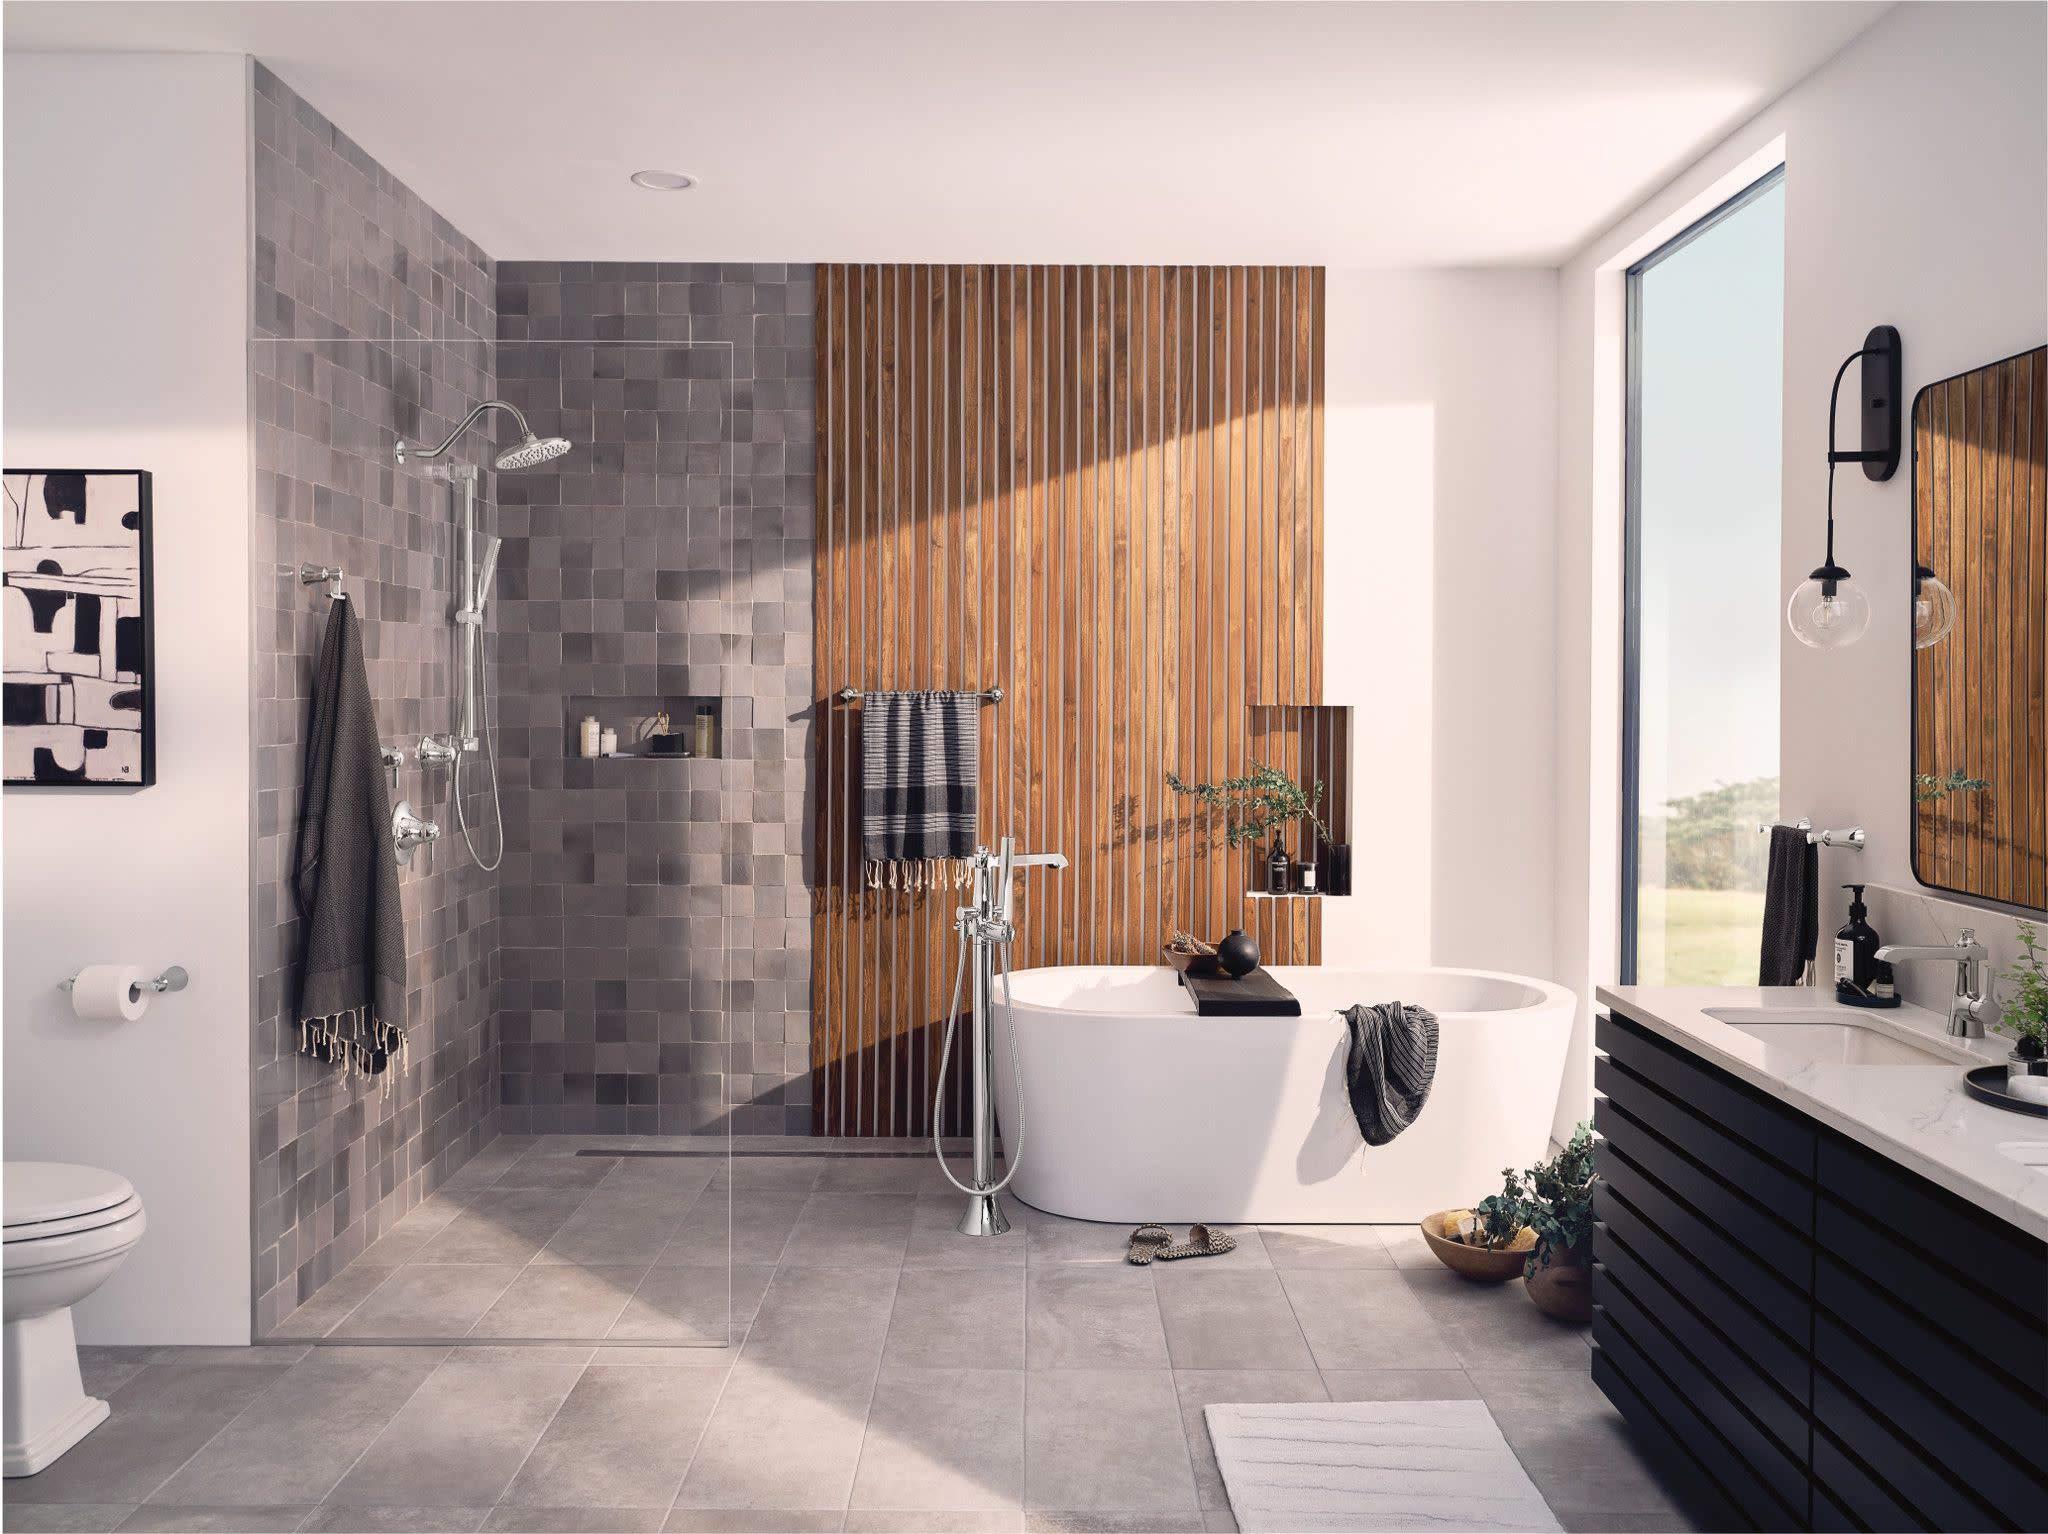 MOEN Hand Shower Handheld Showerhead Wall Mount 3 Spray Setting Bathroom Chrome